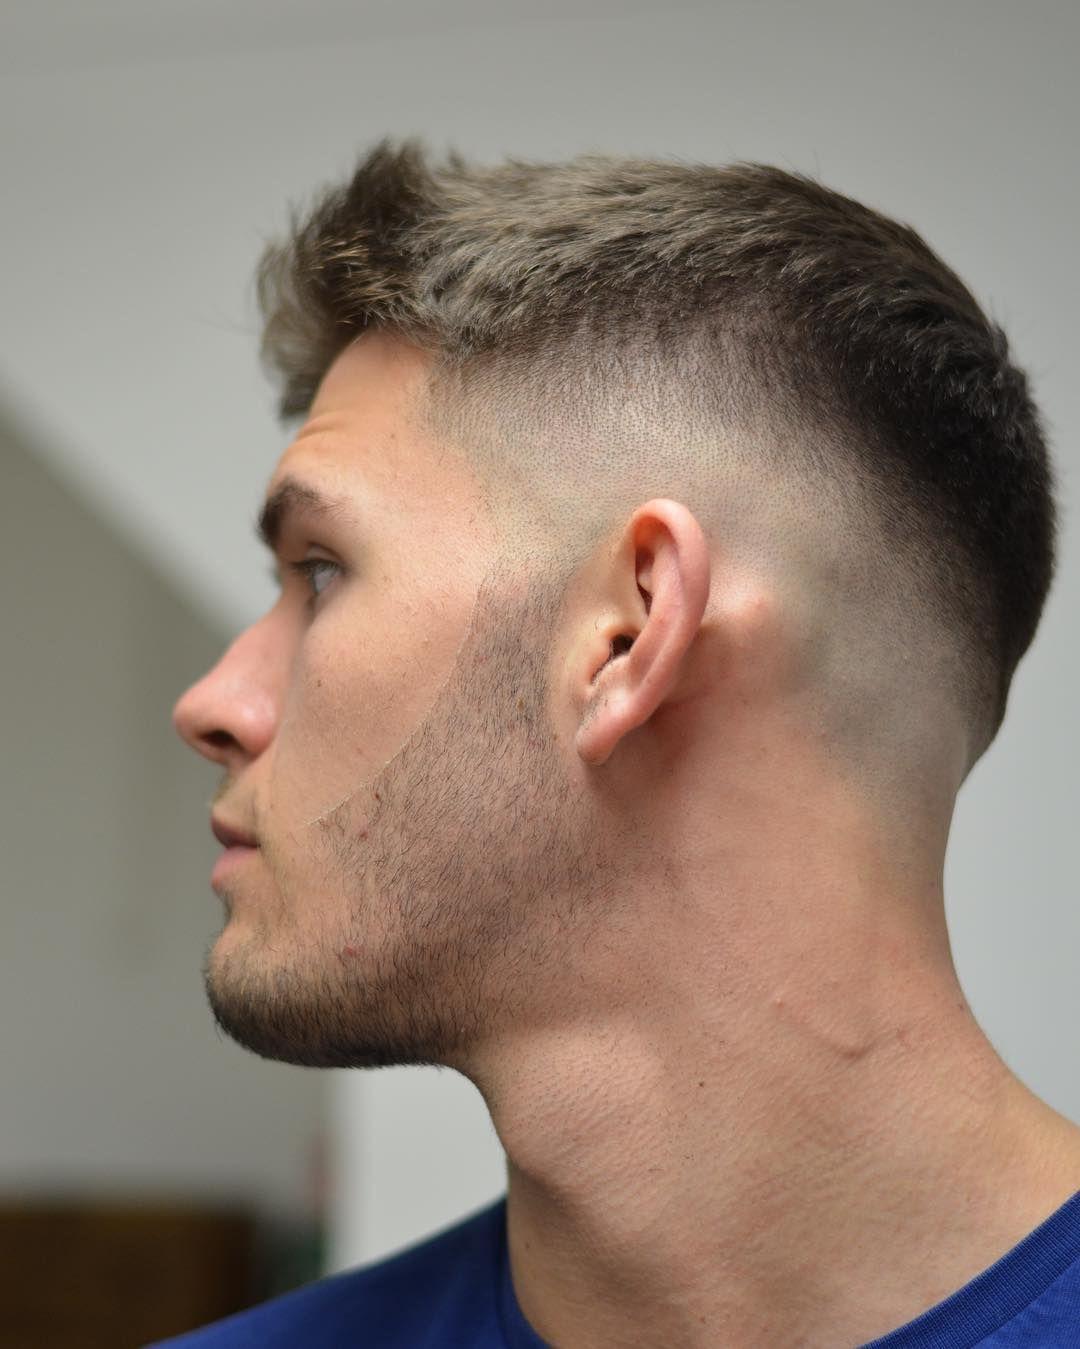 Haircut for men all angles juan montesvillegas jaystylesz on pinterest